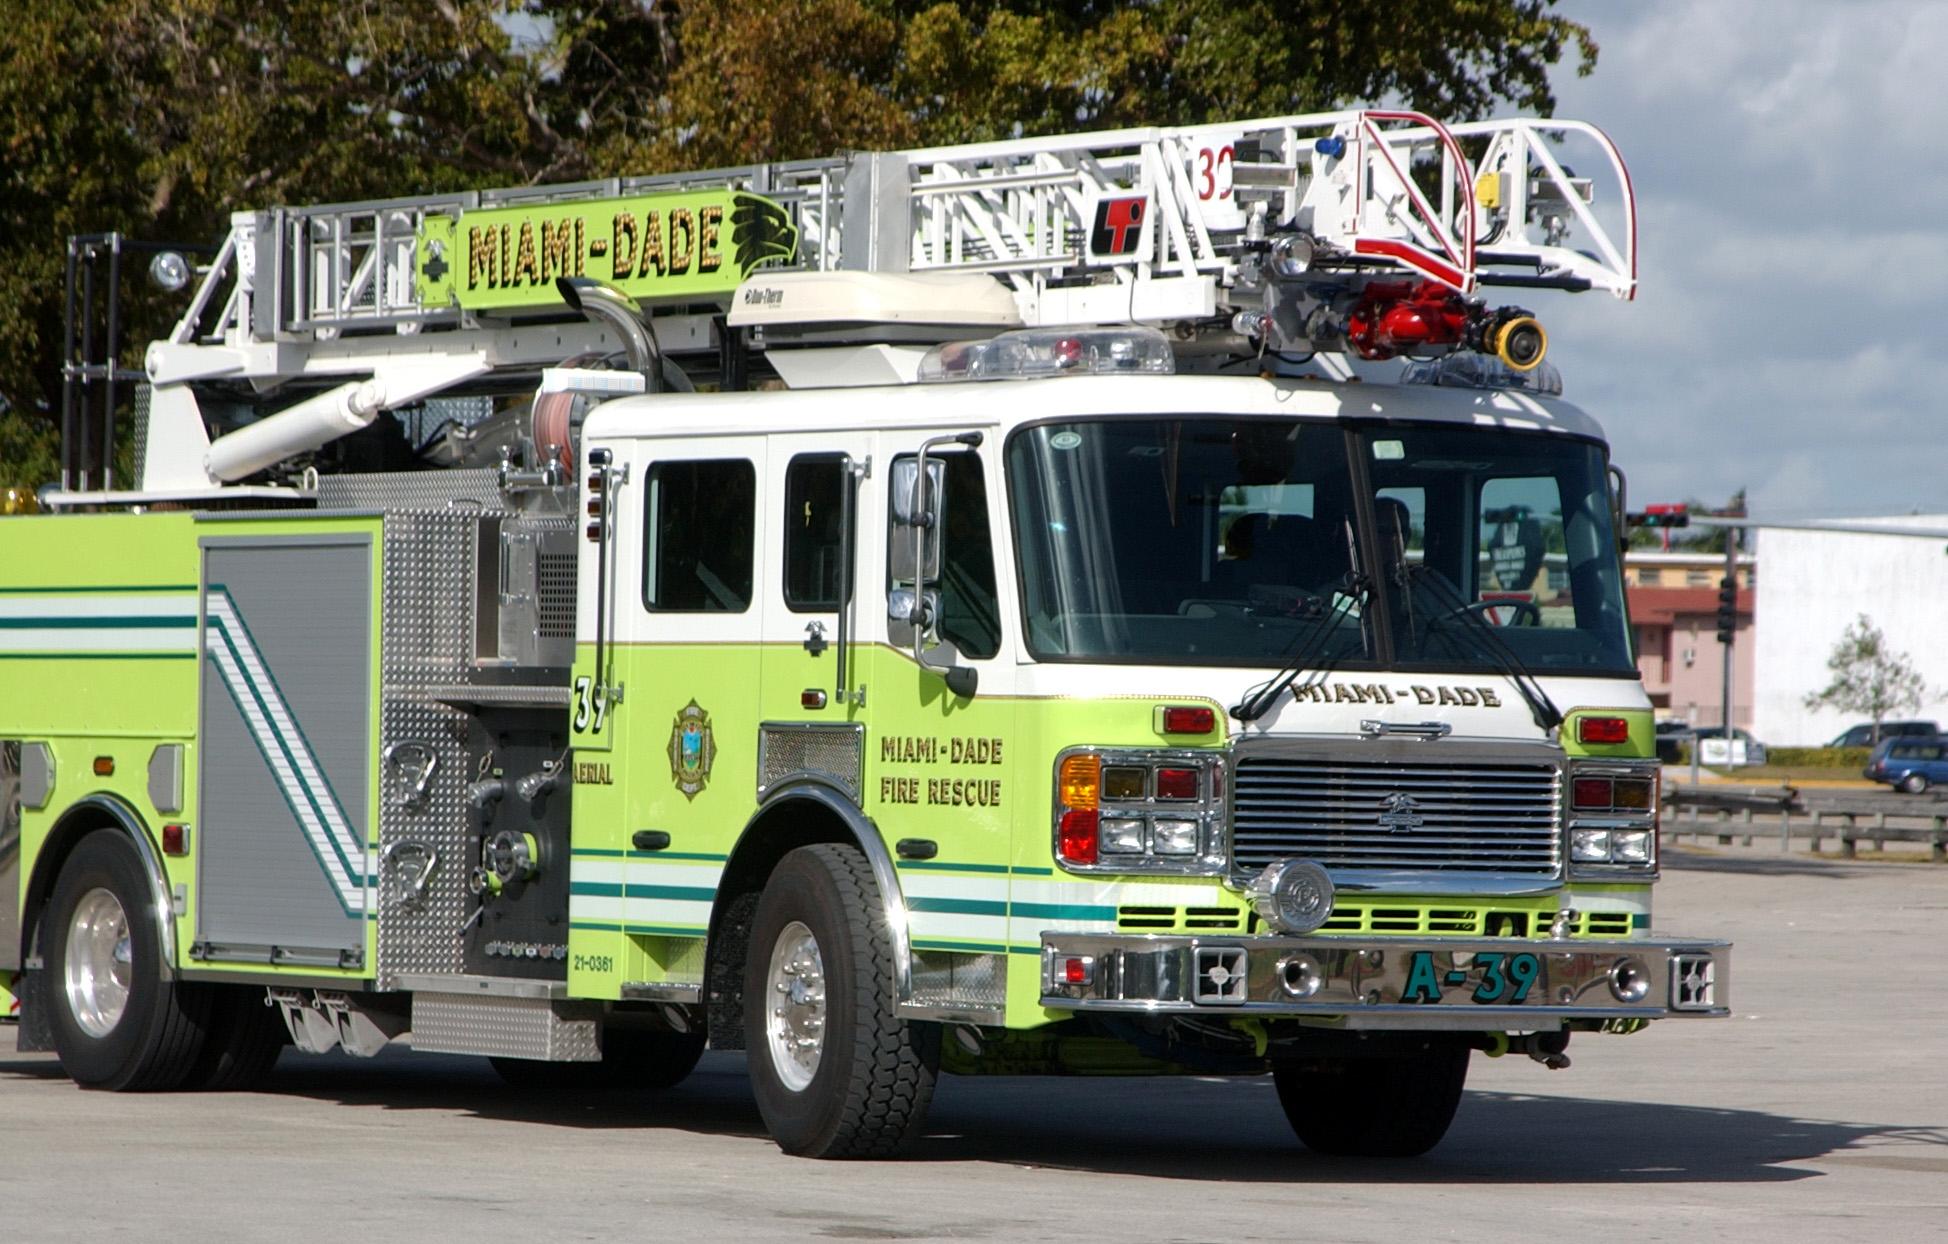 Putnam Used Cars Burlingame Ca